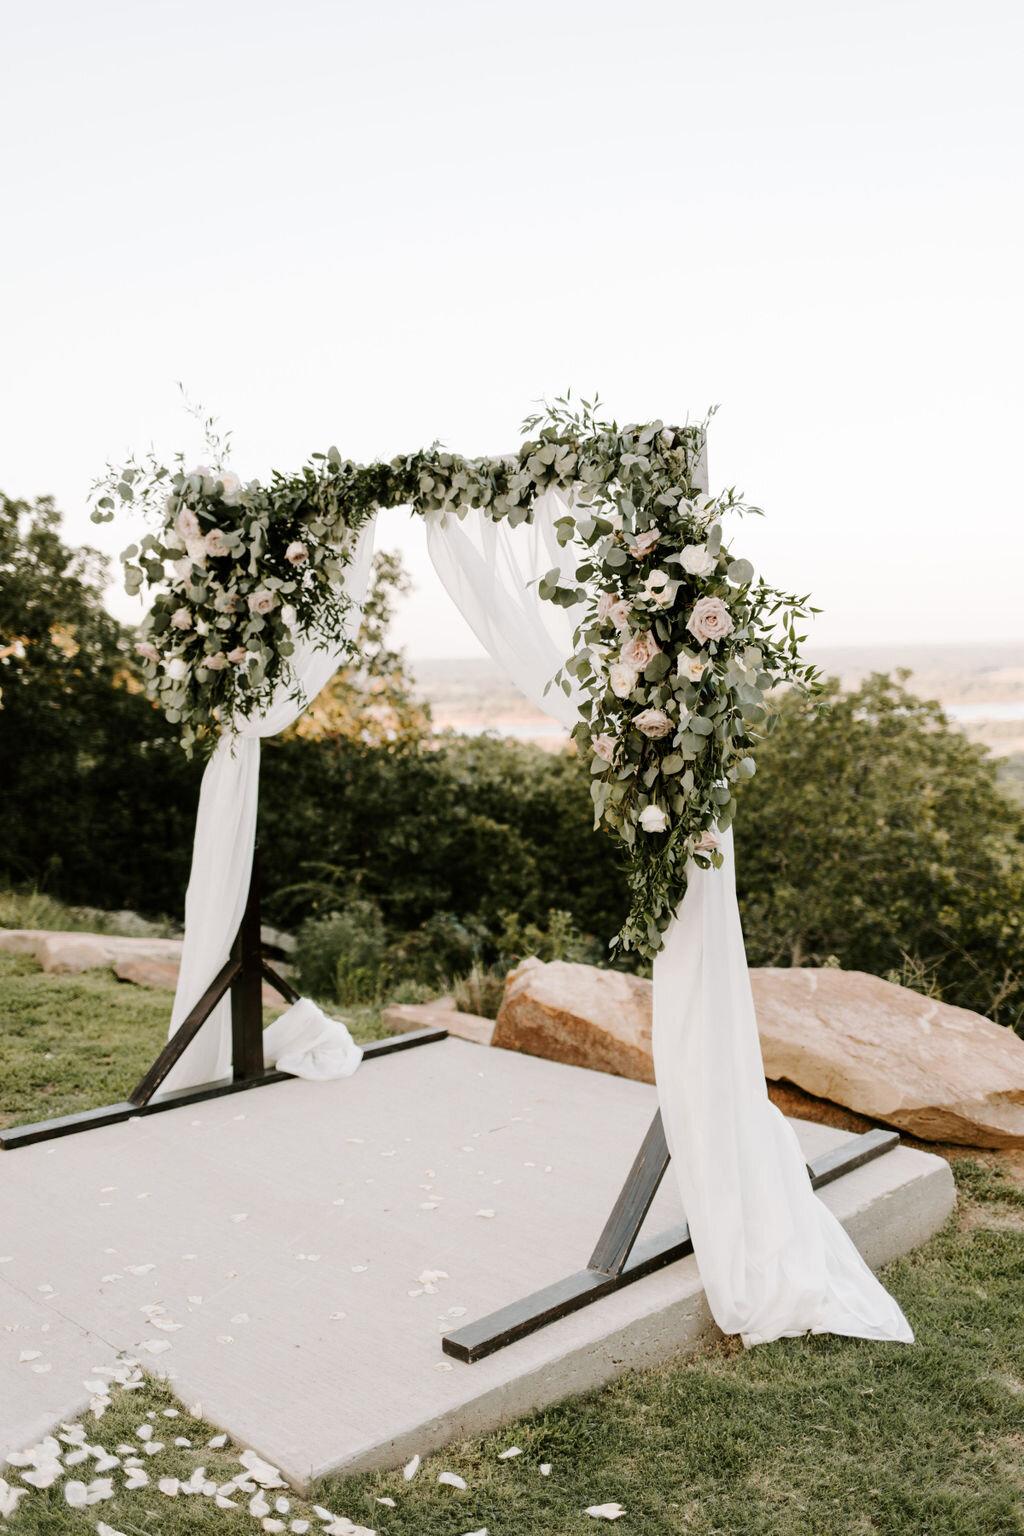 Tulsa White Barn Wedding Venue Outdoor Ceremony 23.JPG